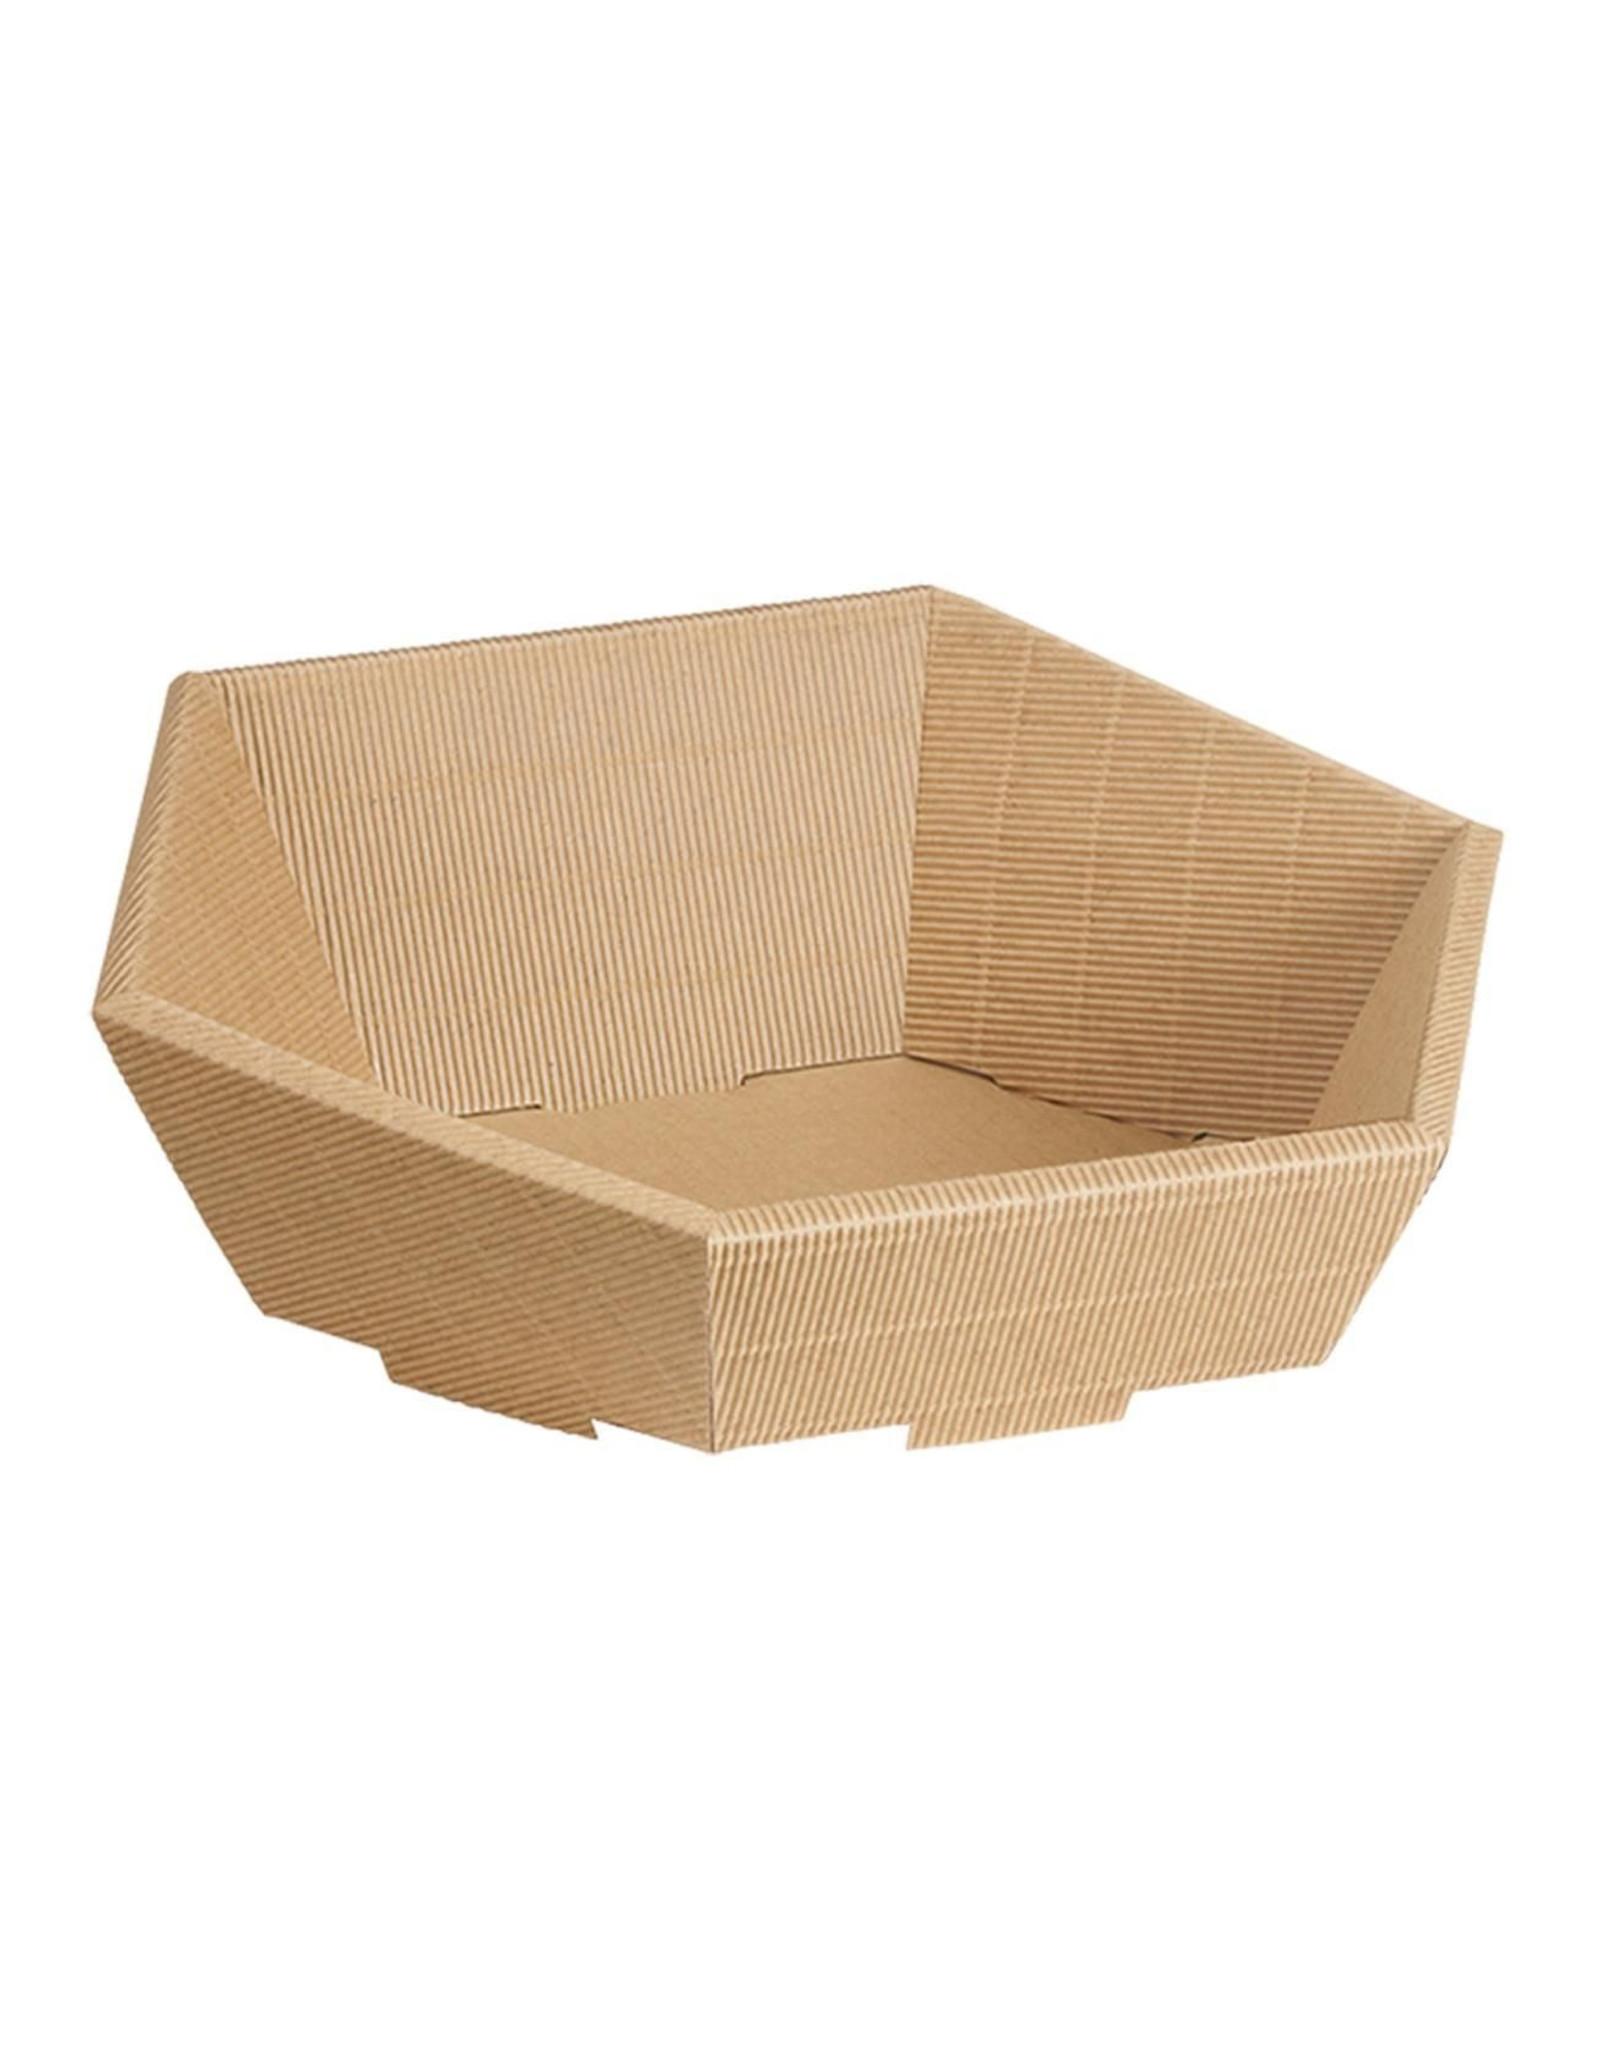 Gift basket 41x46x15cm